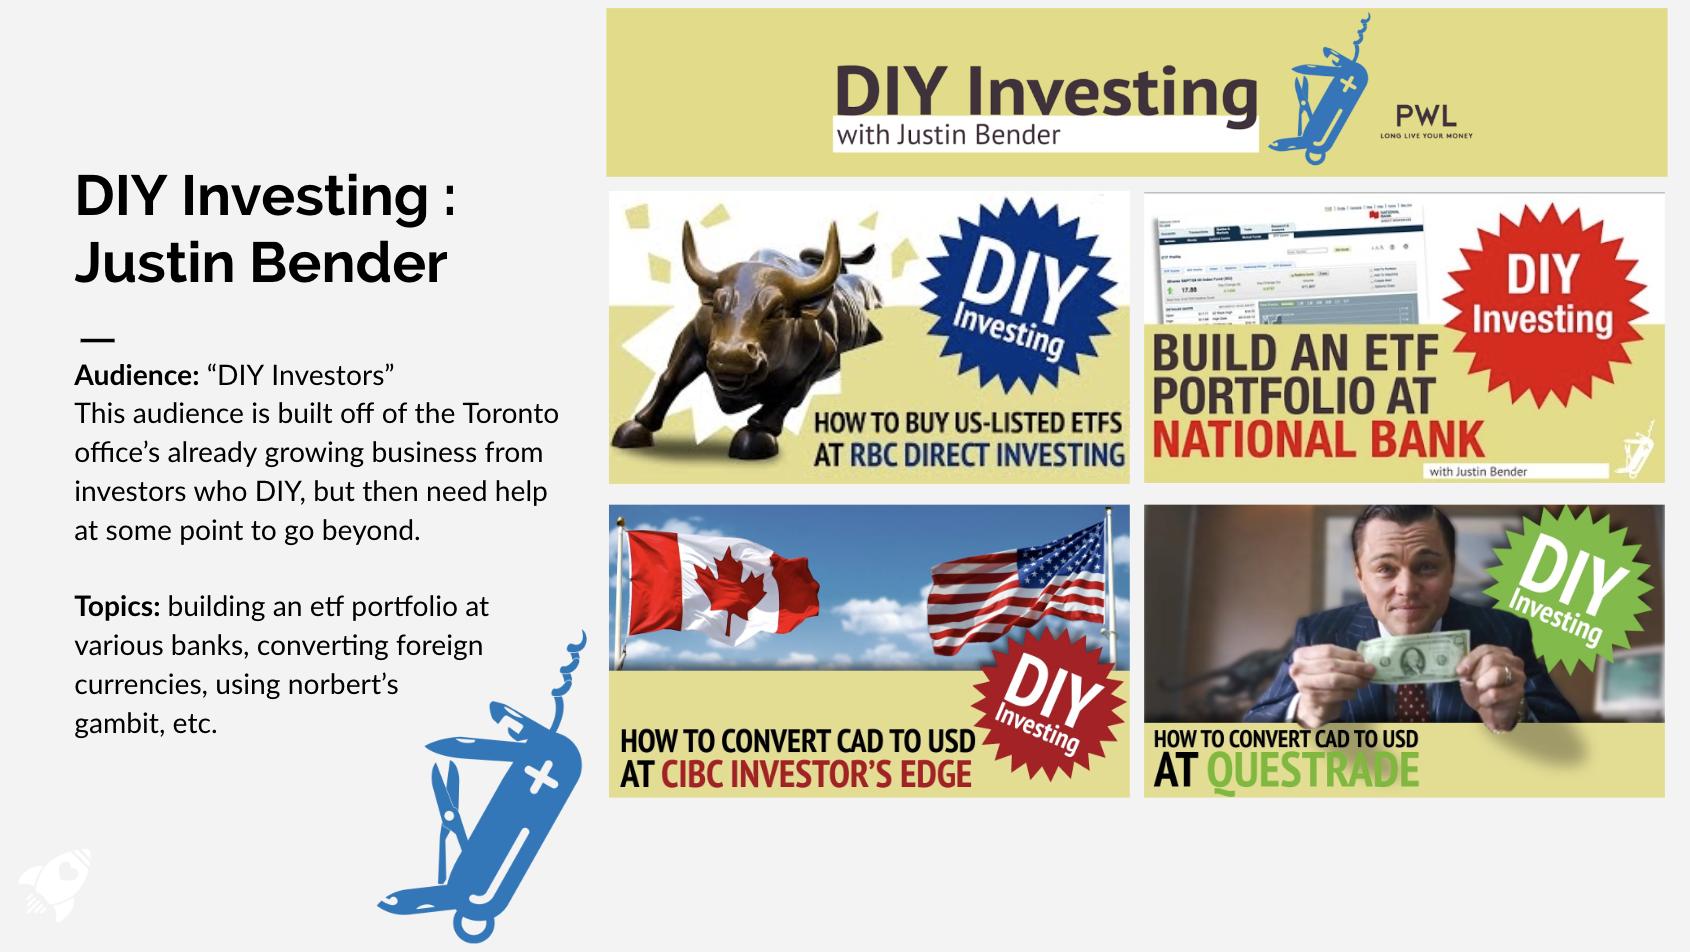 DIY Investing with Justin Bender